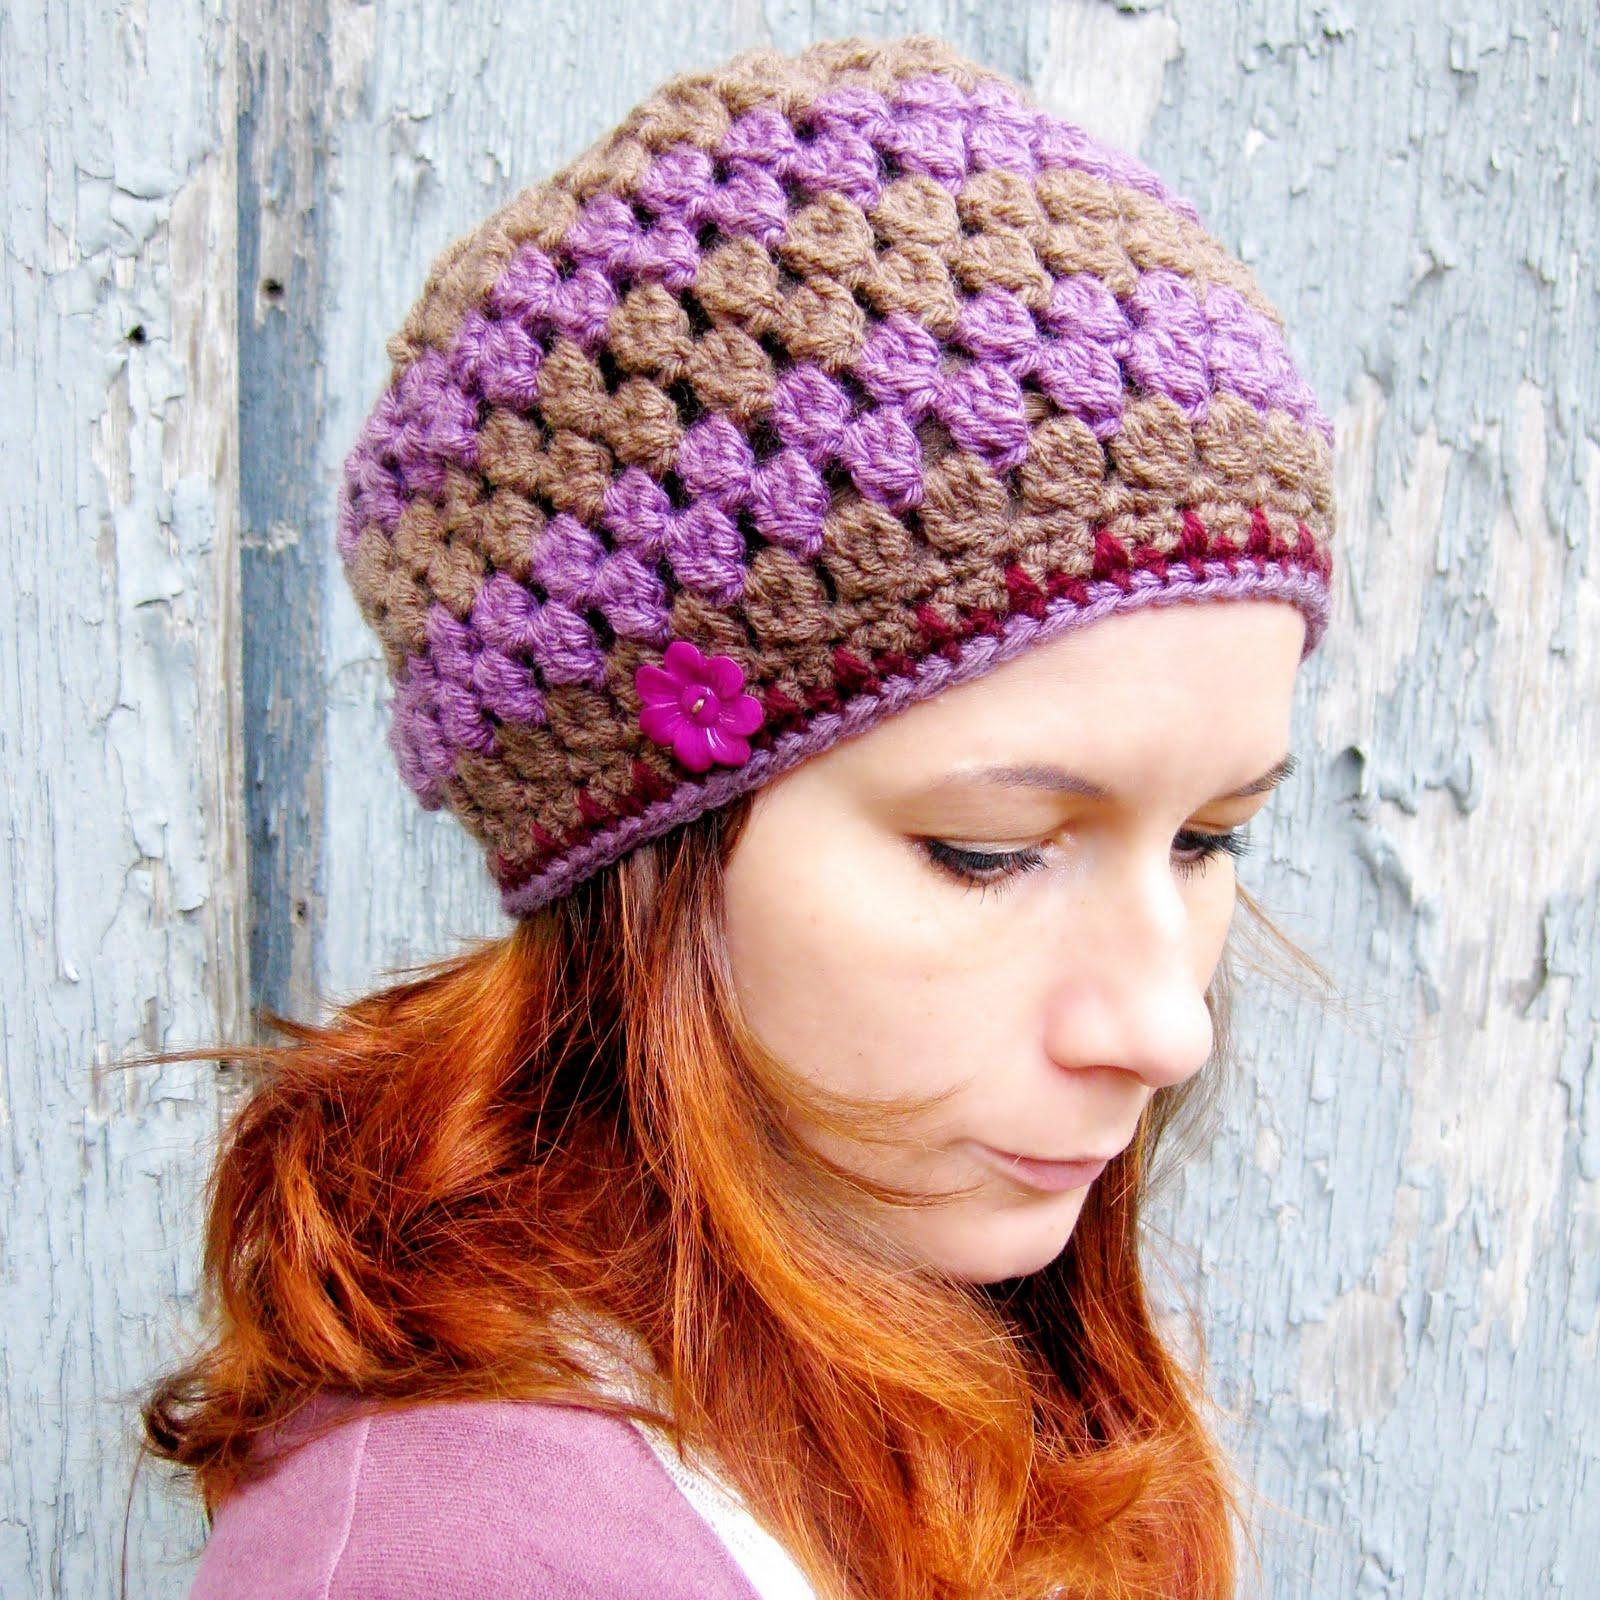 Crochet Hat Patterns With Instructions : Handmade by Viki: Free PDF Crochet Pattern